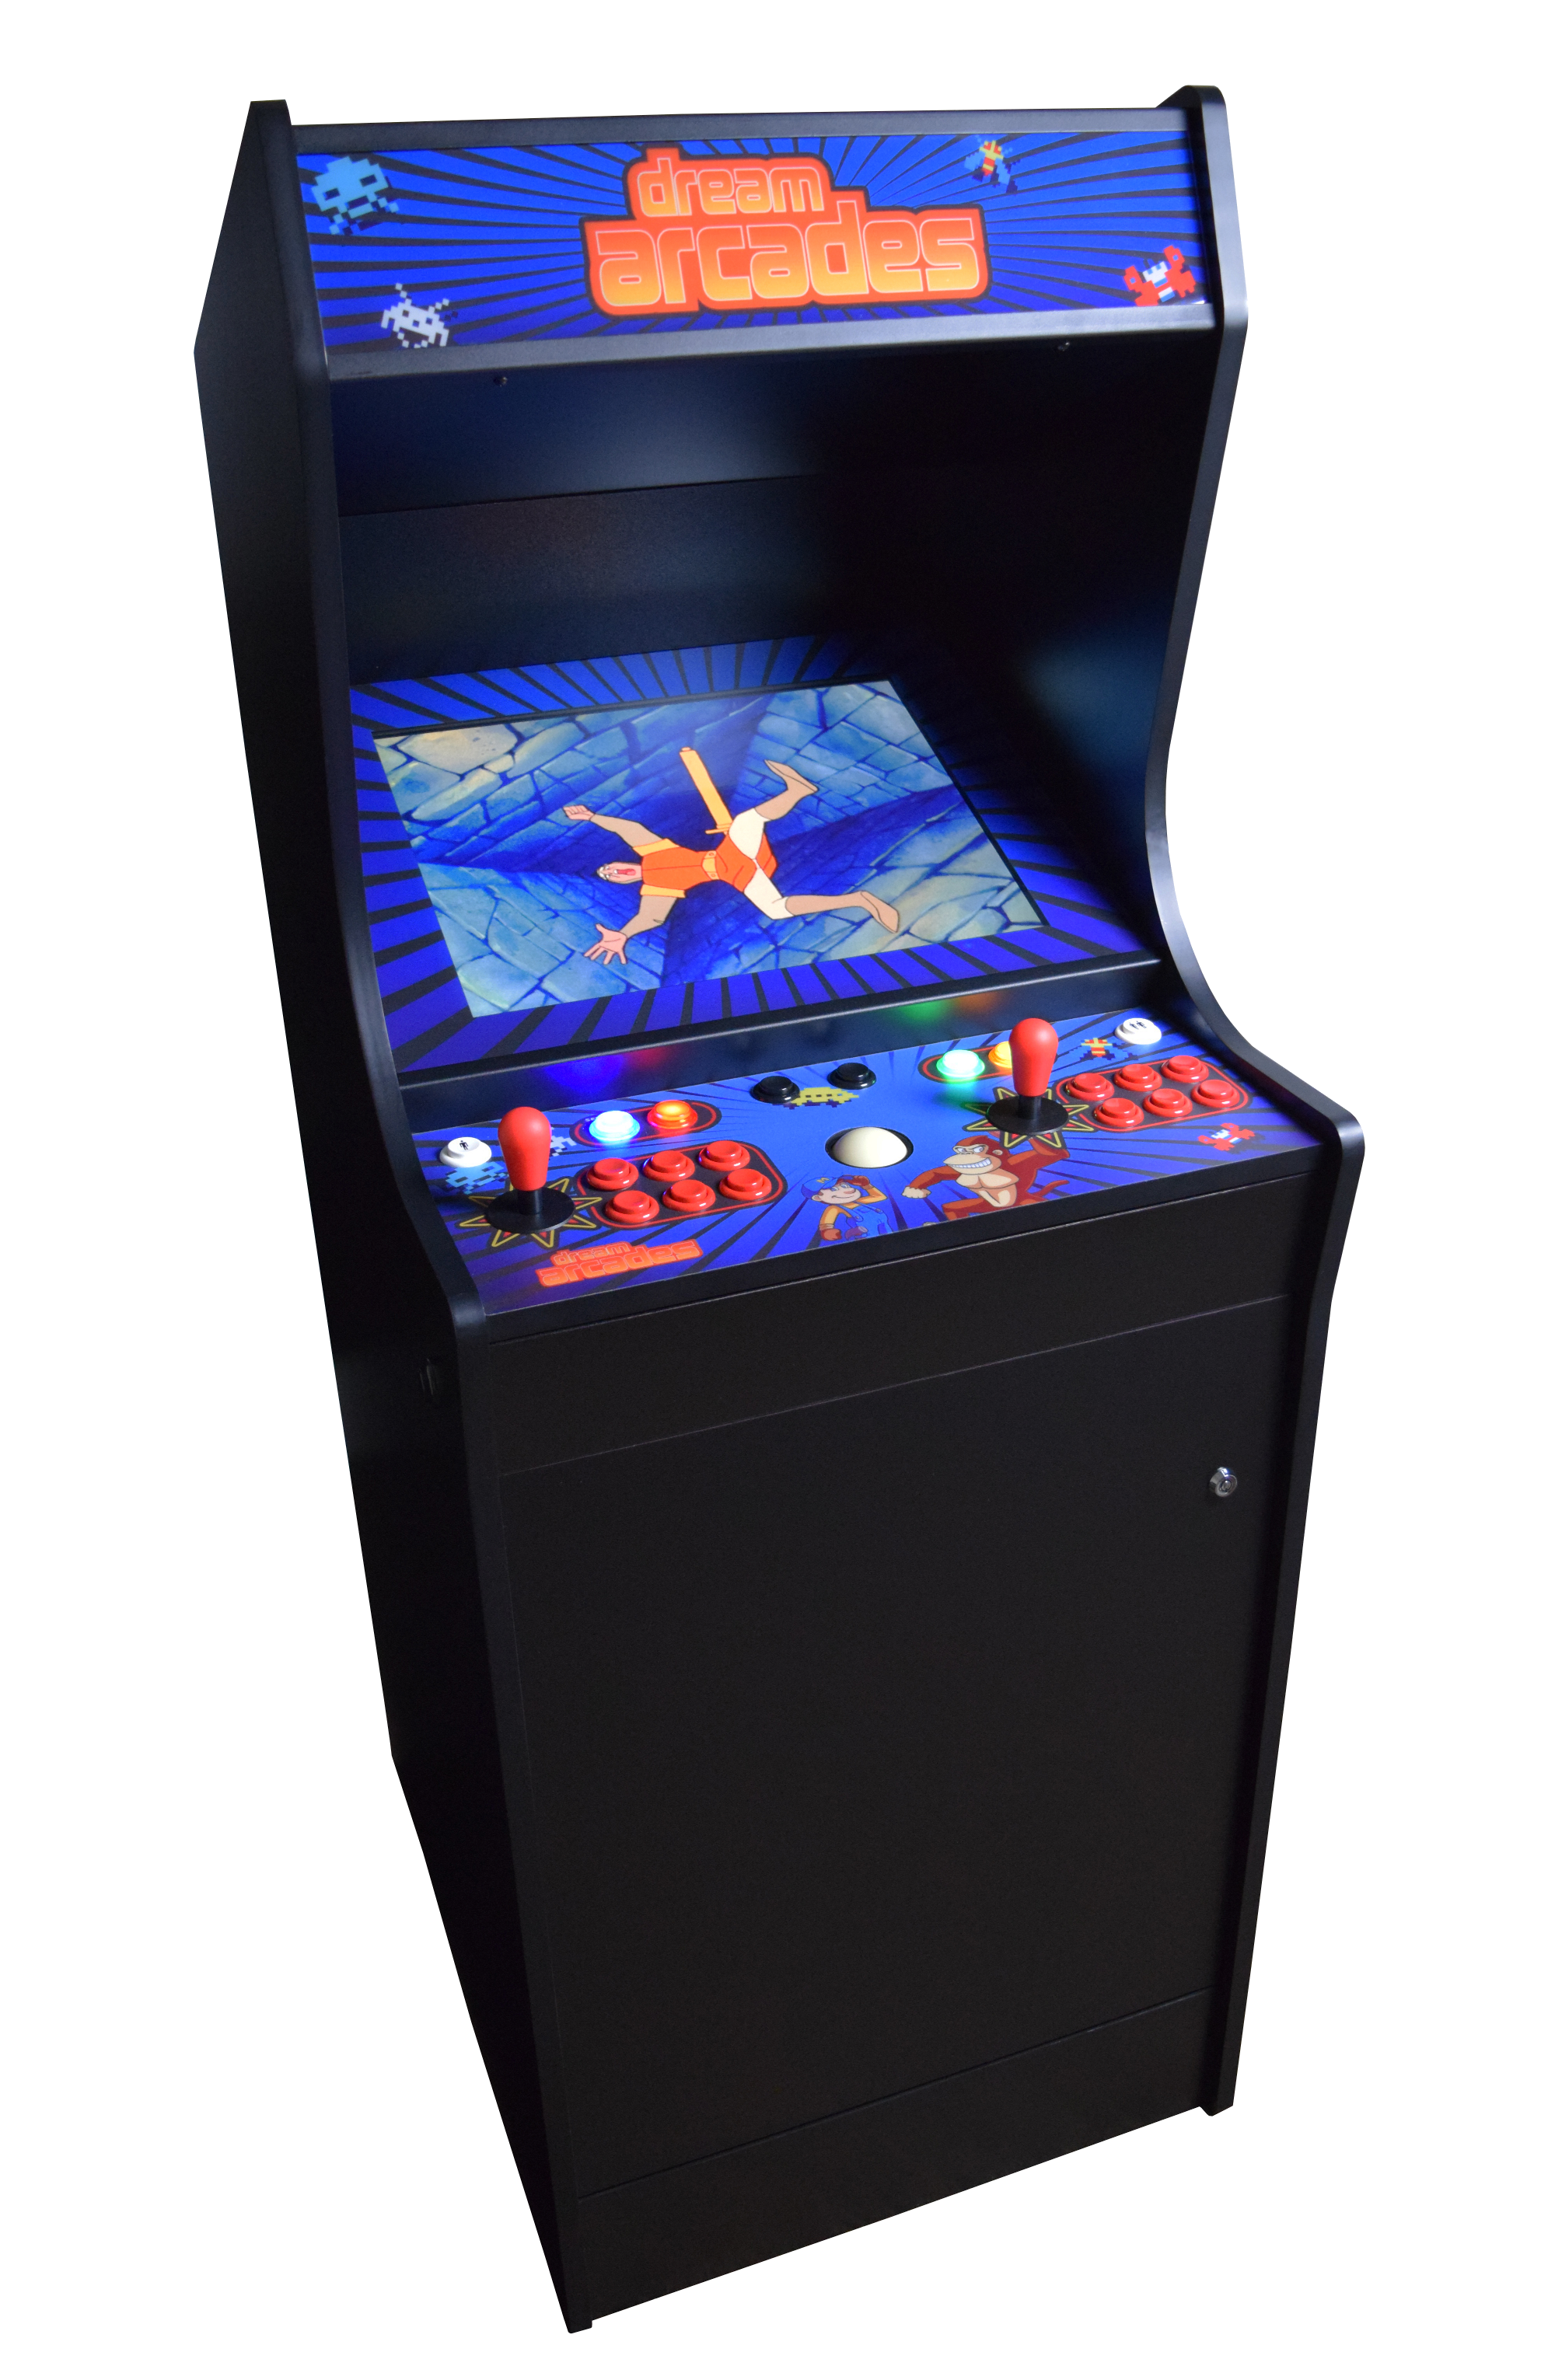 Cabaret Video Arcade Machine Arcade Game Machines